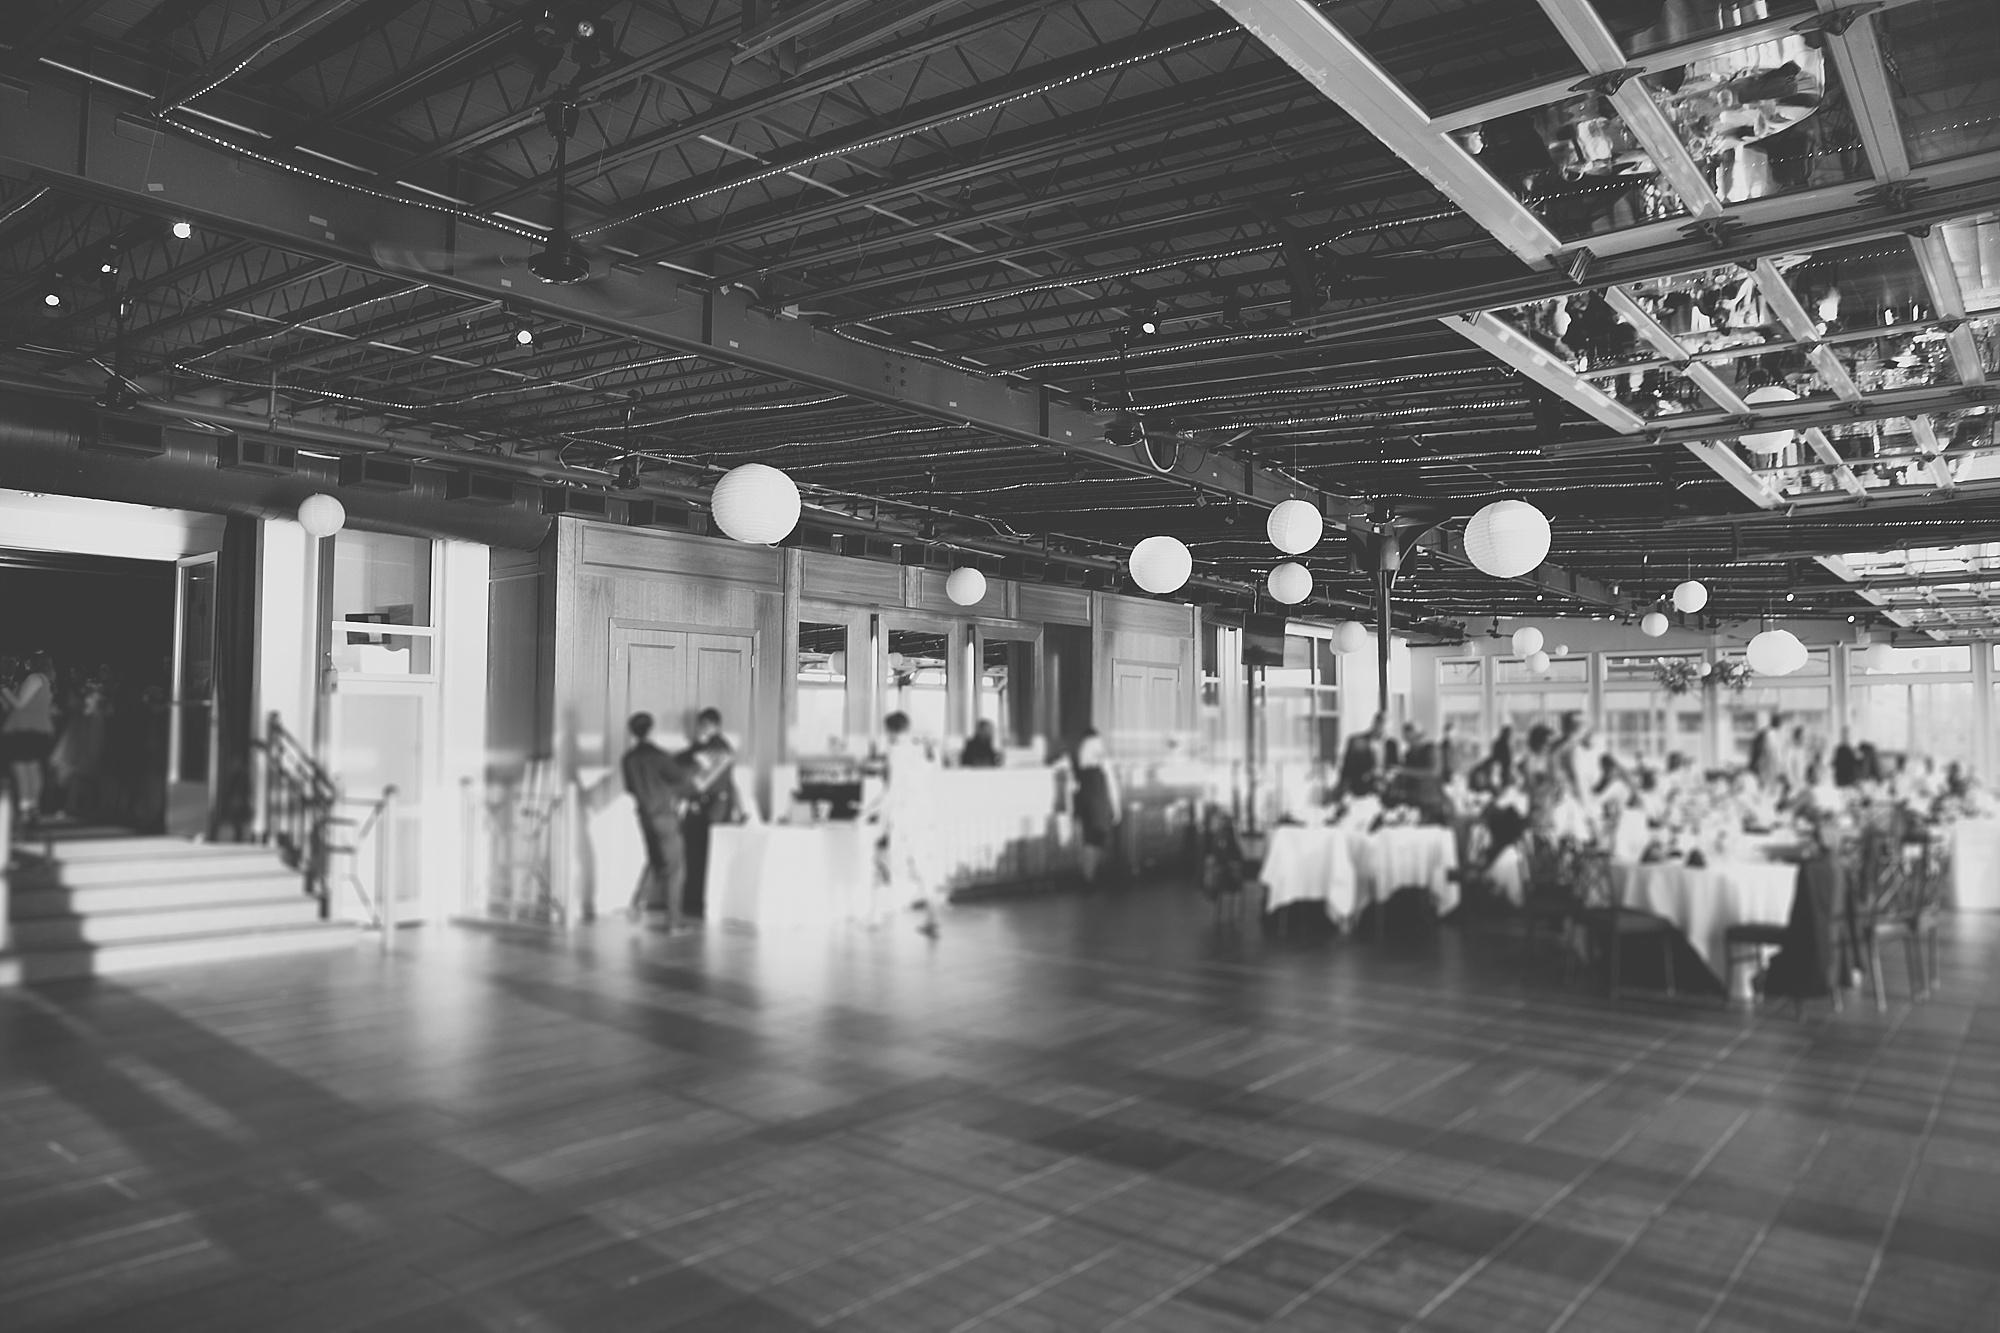 Joe_Mac_Creative_Rachel_and_Matt_Wedding_Photography_0024.jpg